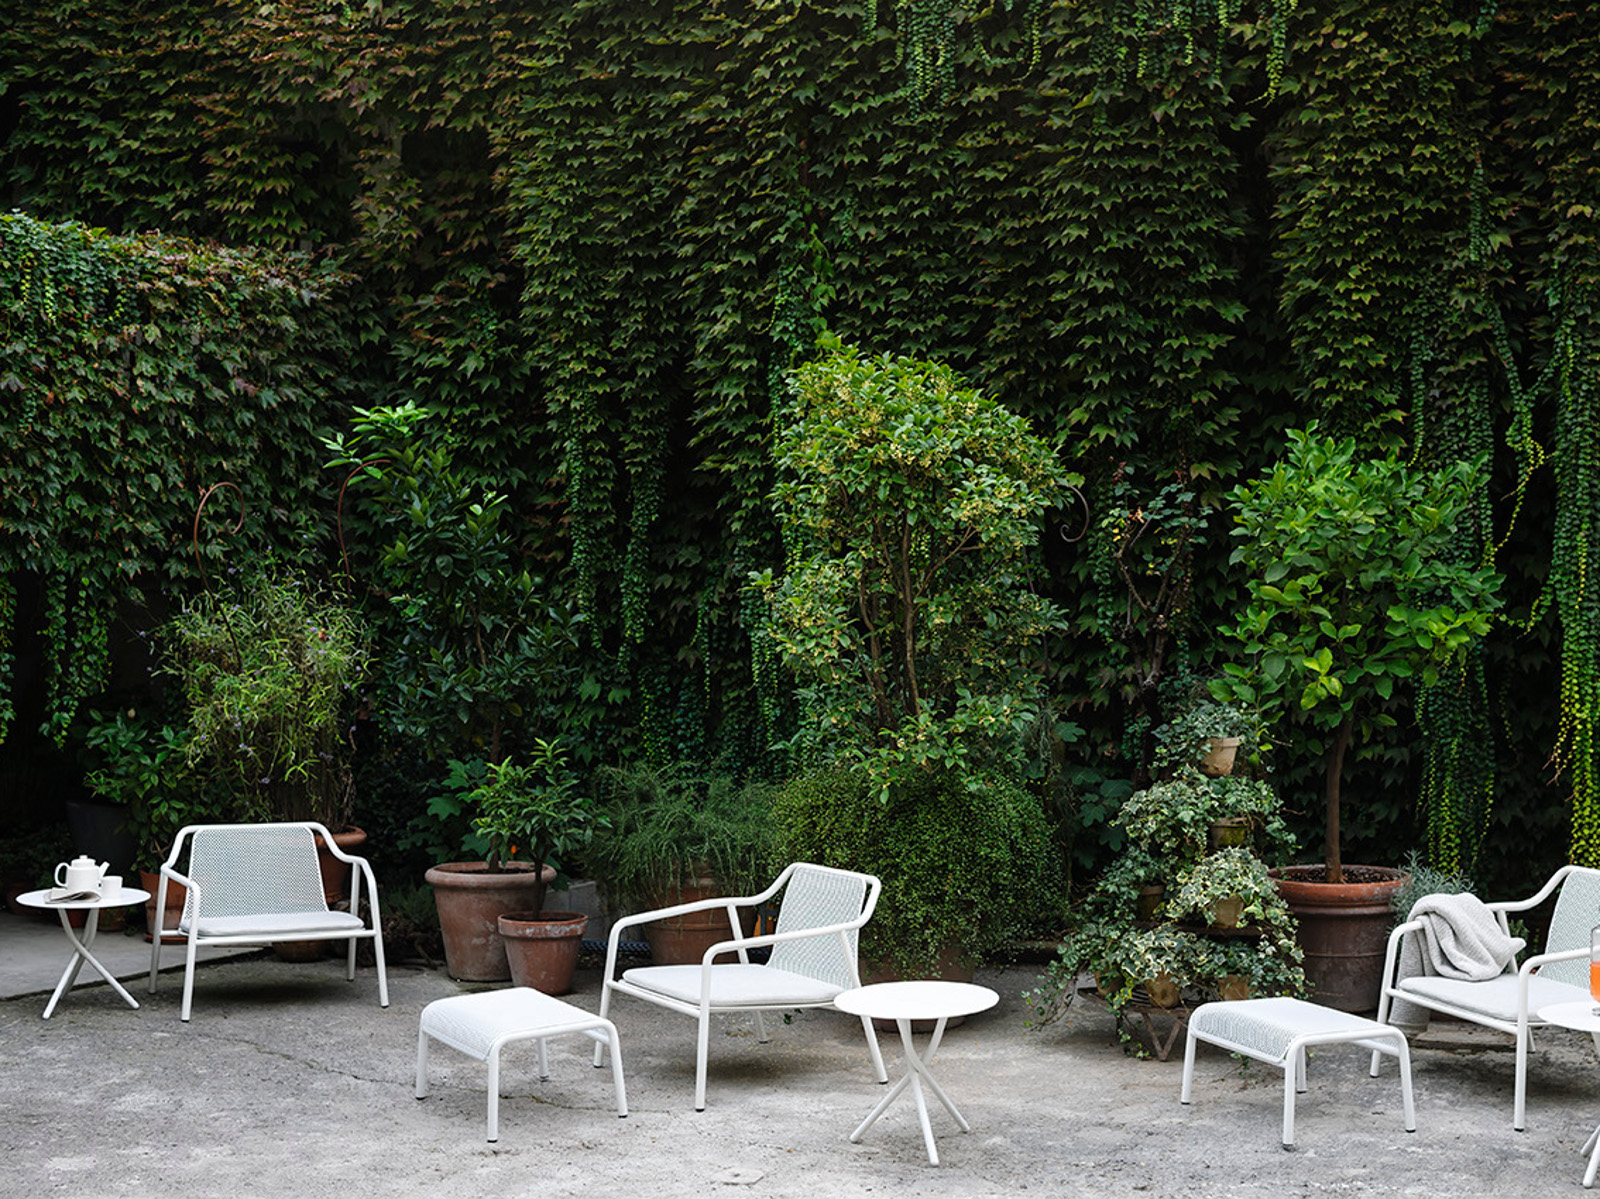 Poltrona da giardino in metallo con poggiapiedi jacket for Outdoor giardino